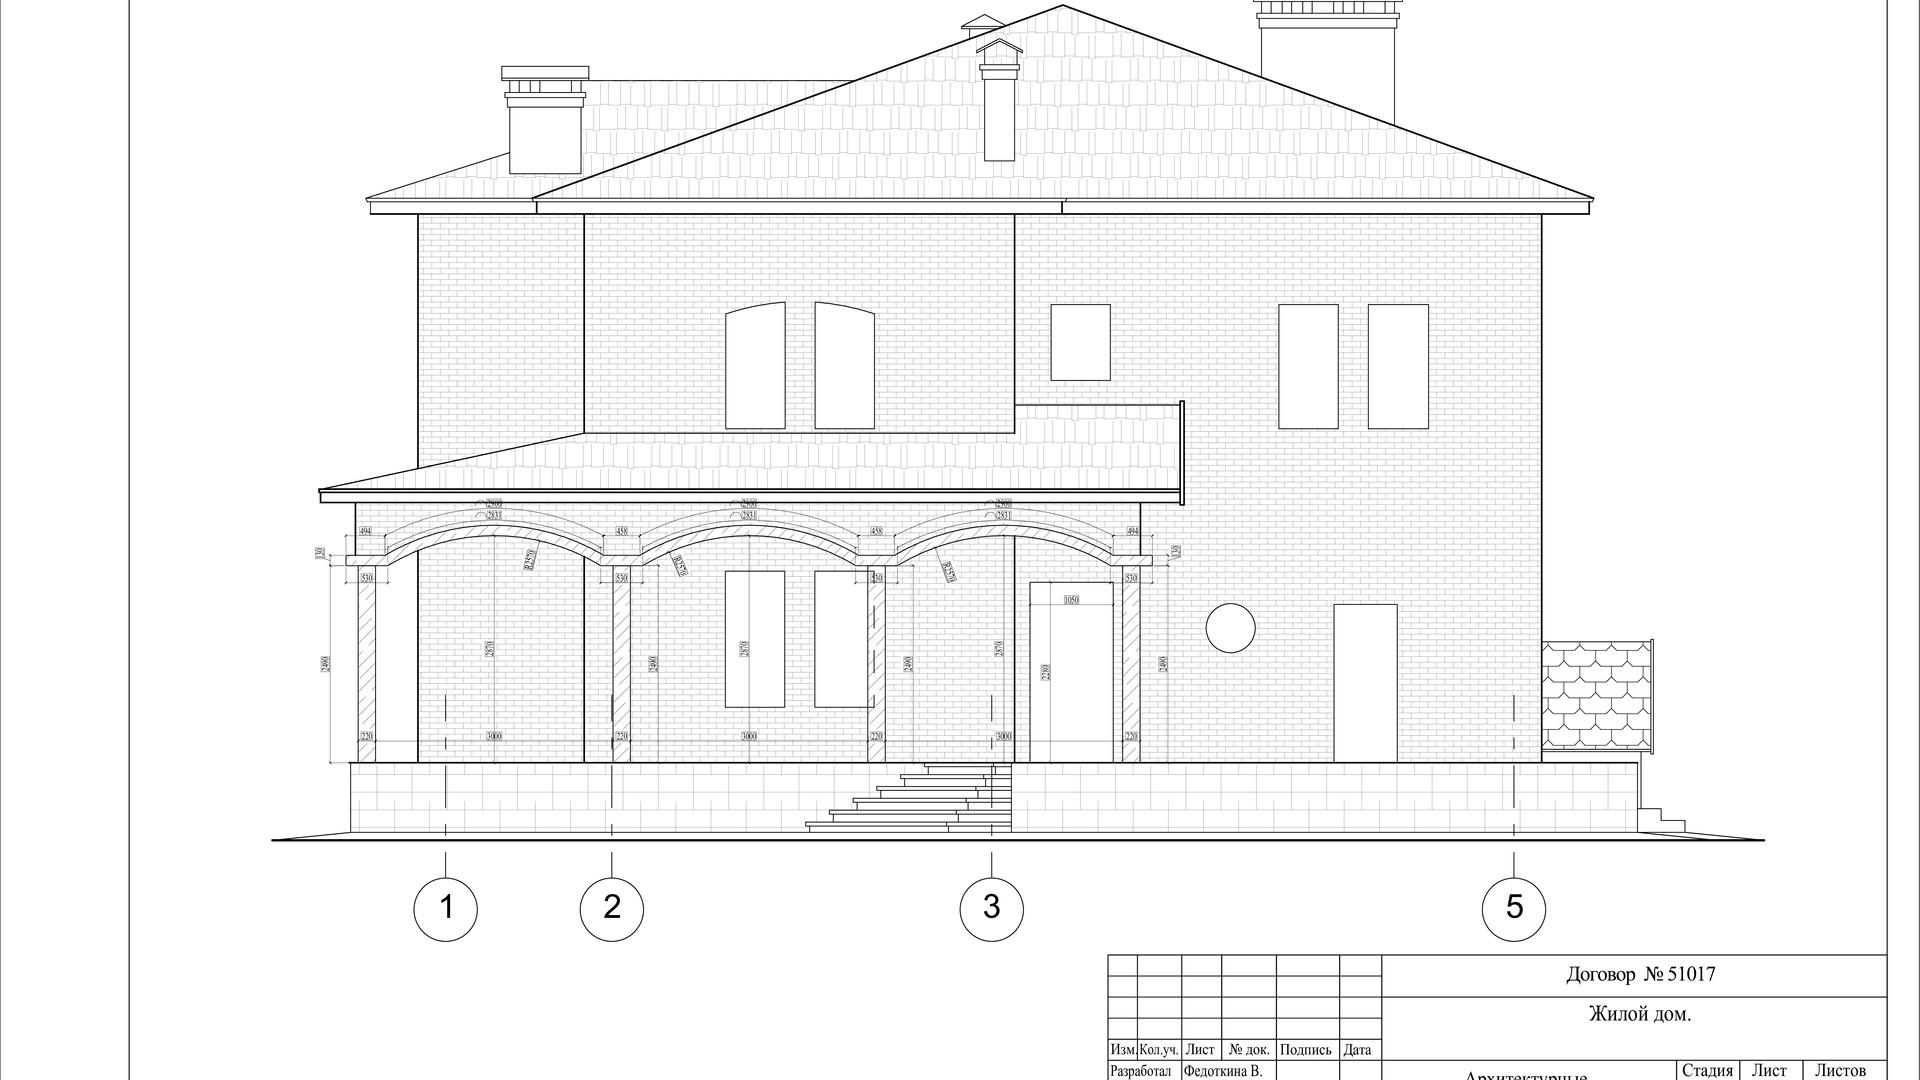 3. Фасад 1-5_обмеры терраса_А2 (pdf.io).